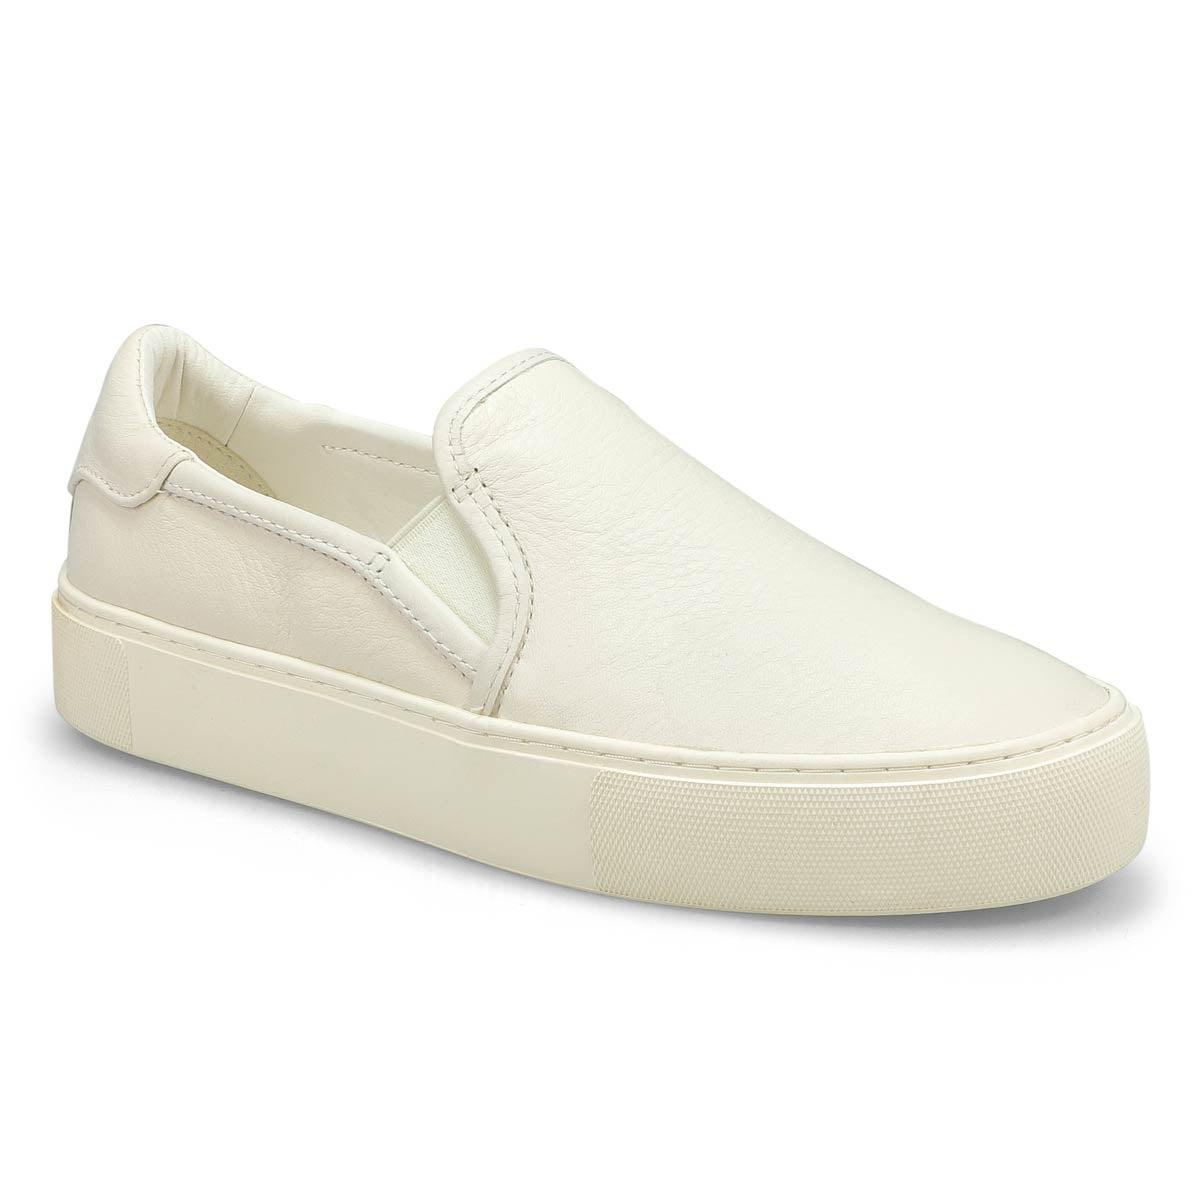 Women's Jass Slip On Shoe - White